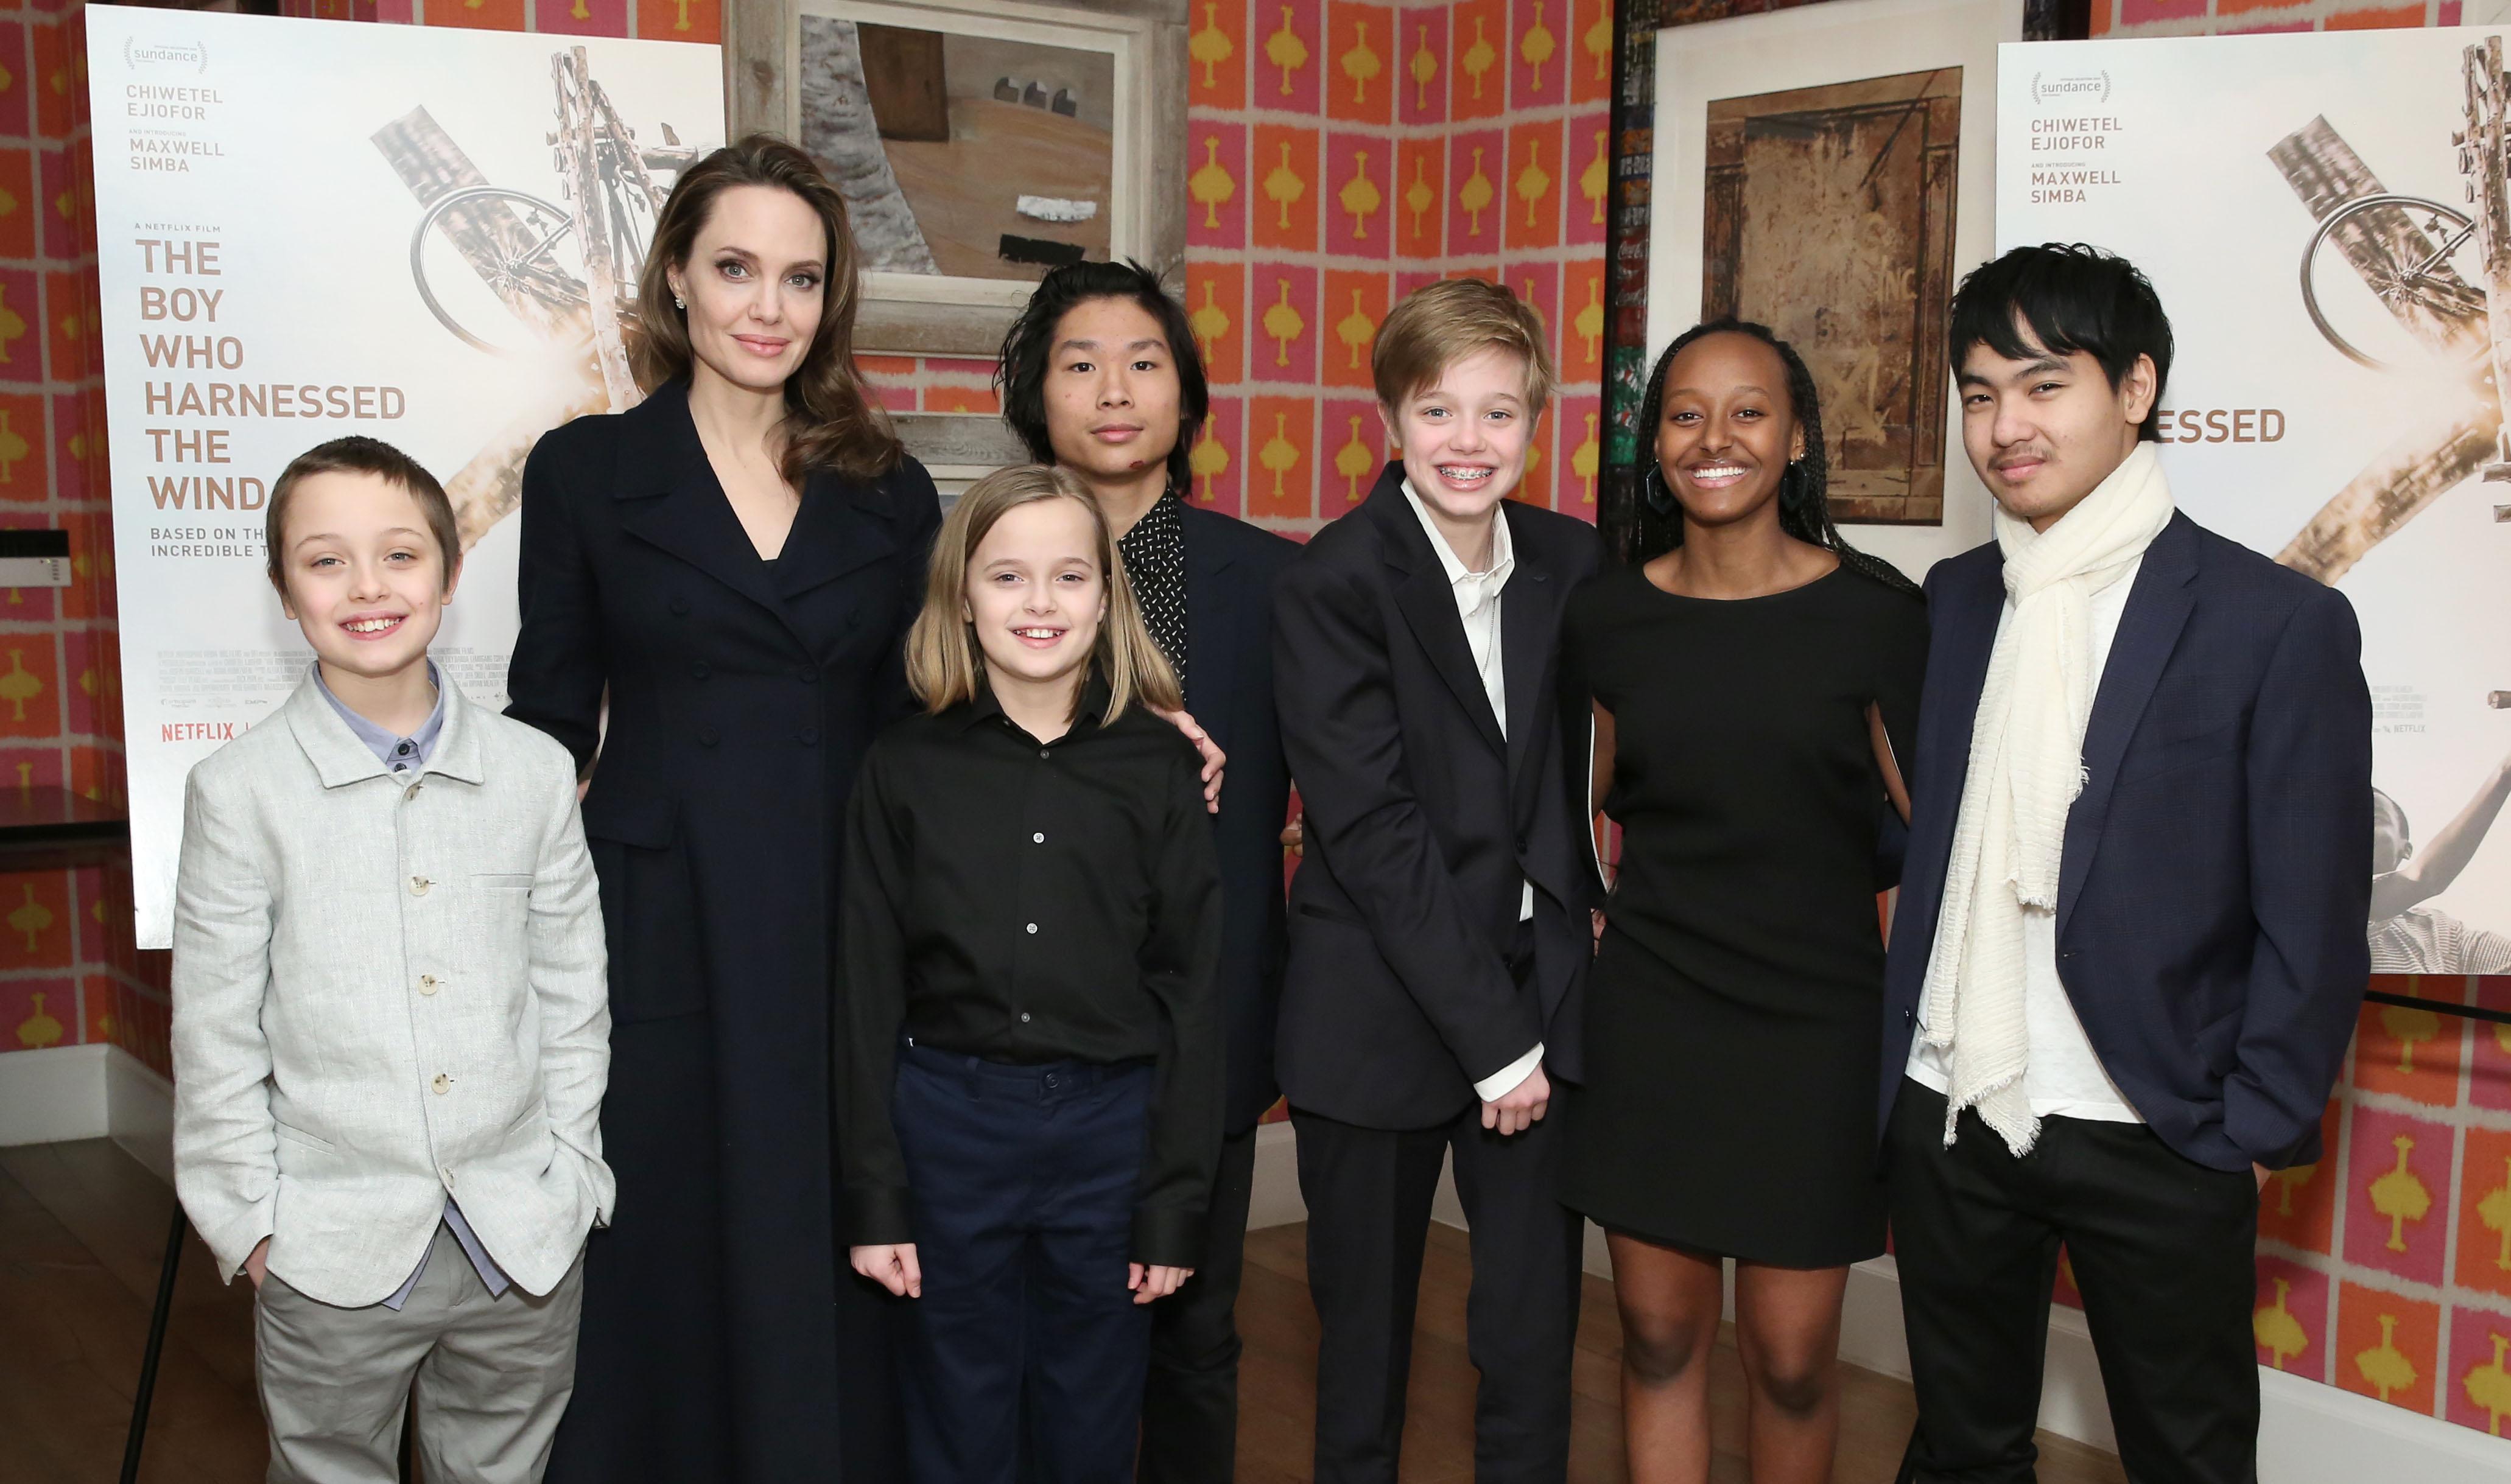 Angelina Jolie with children Knox Leon Jolie-Pitt, Vivienne Marcheline Jolie-Pitt, Pax Thien Jolie-Pitt, Shiloh Nouvel Jolie-Pitt, Zahara Marley Jolie-Pitt and Maddox Chivan Jolie-Pitt